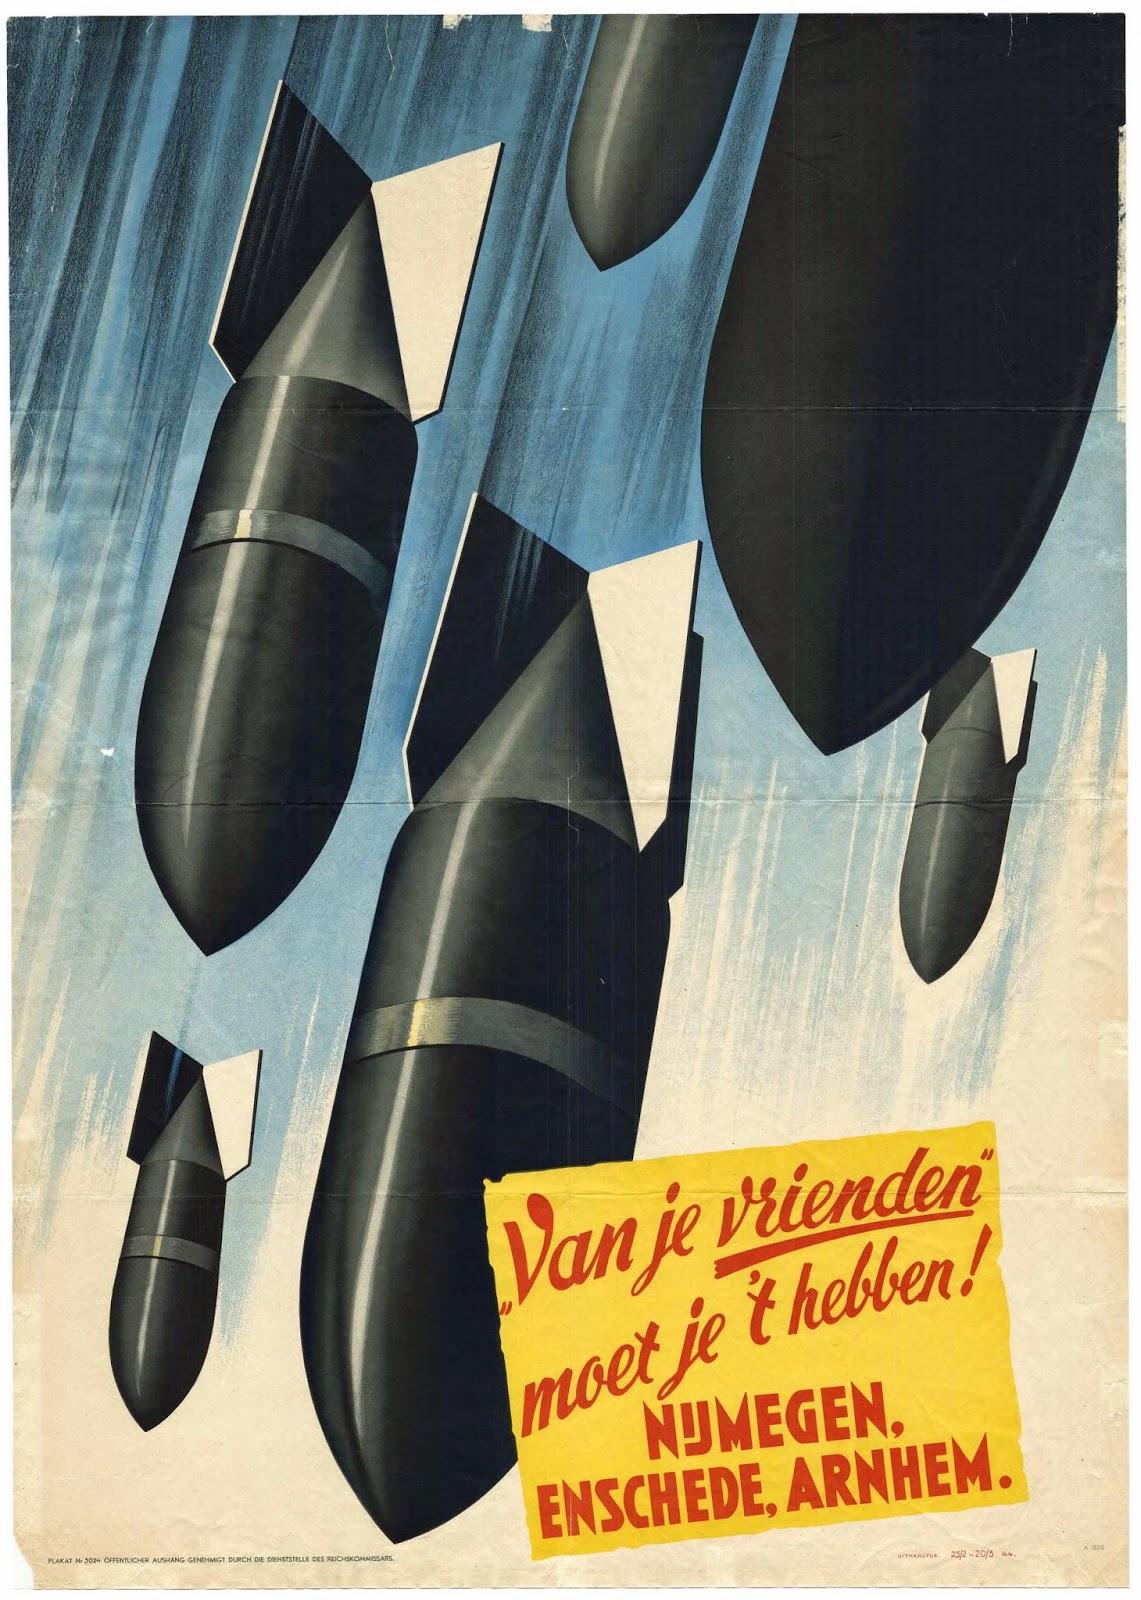 Duitse propagandaposter